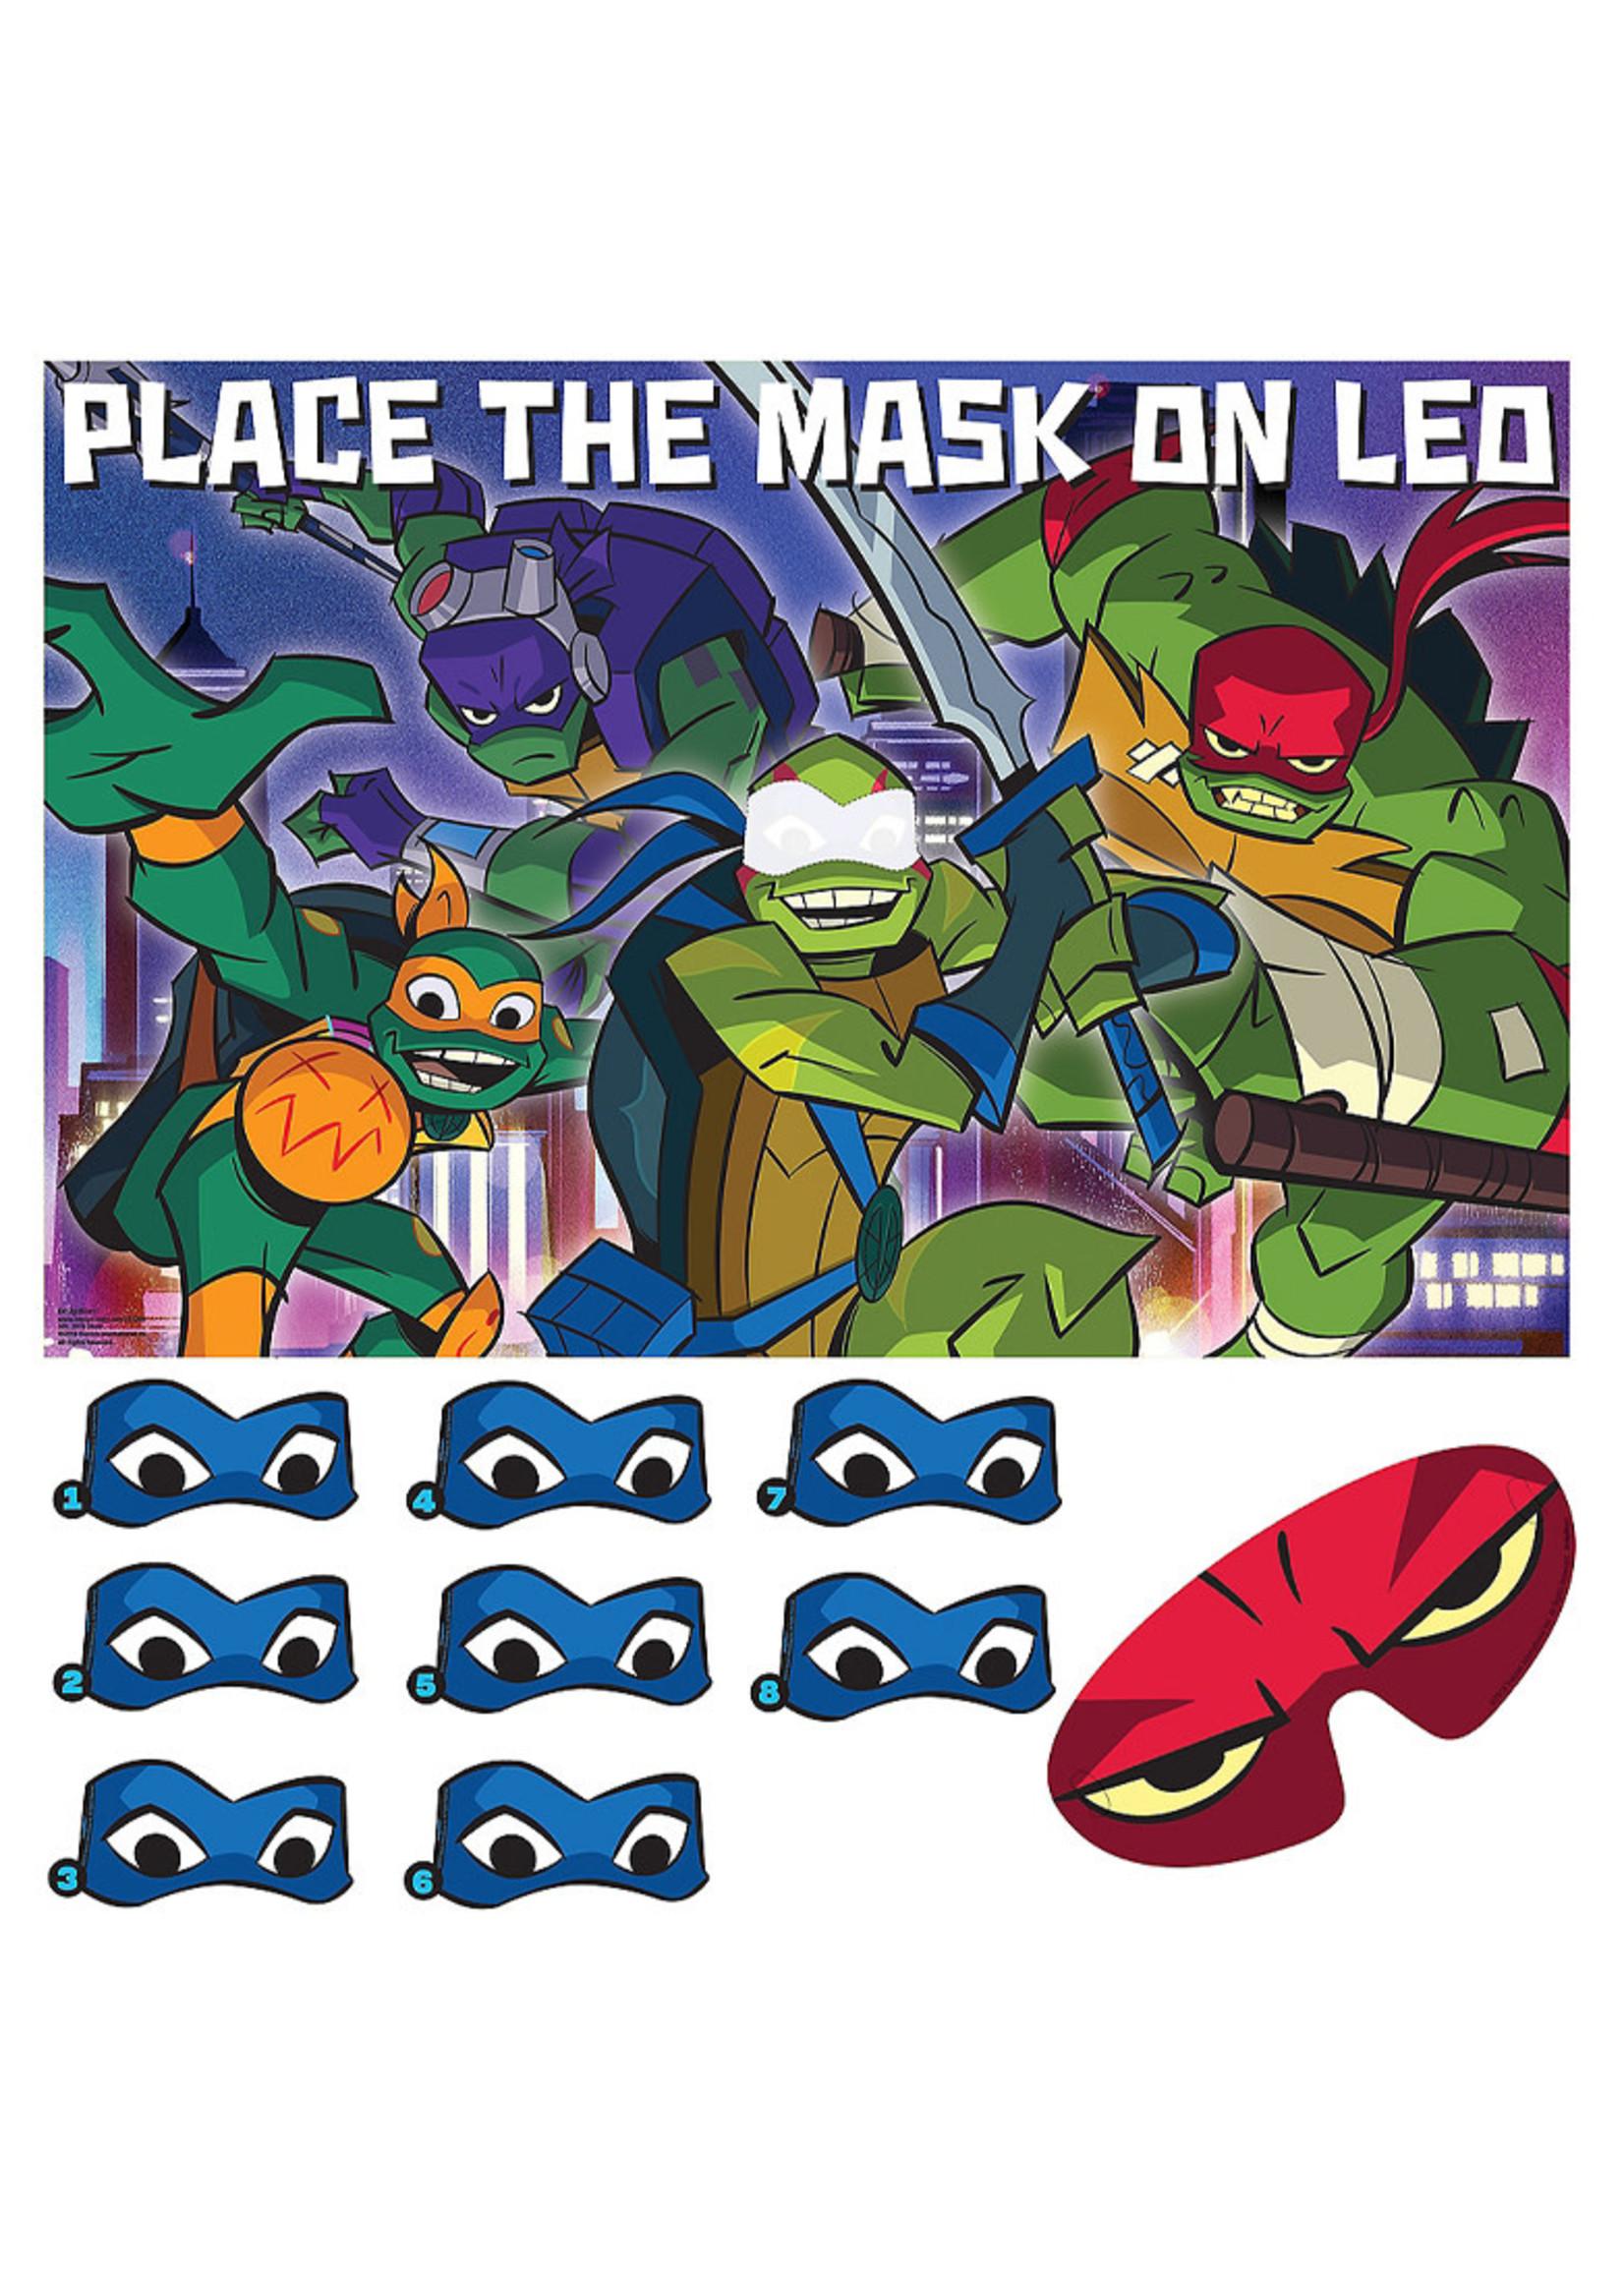 Rise of the Teenage Mutant Ninja Turtles Party Game